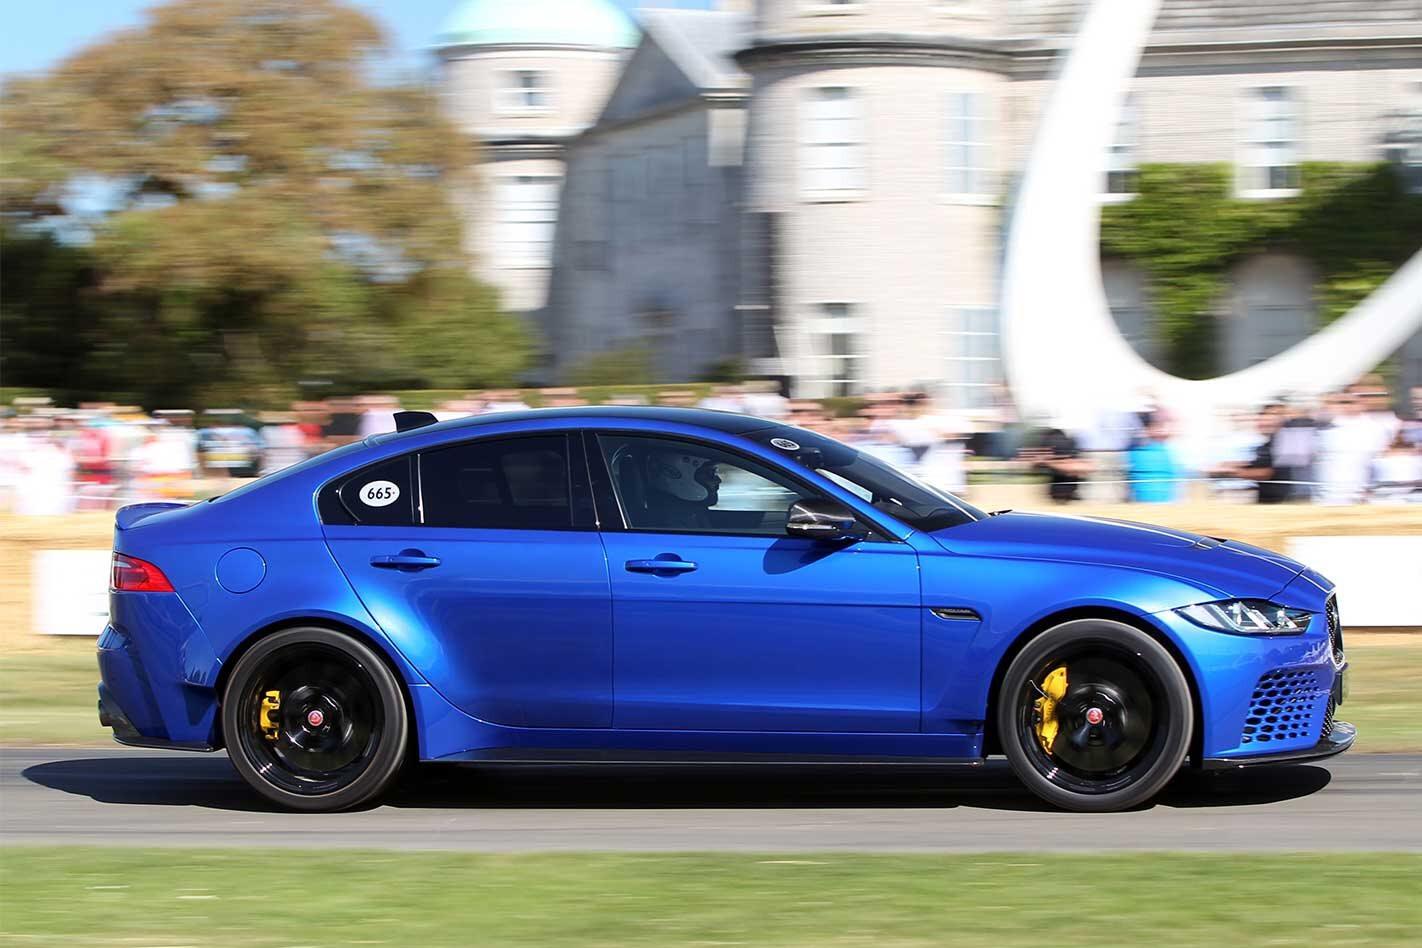 2019 Jaguar XE SV Project 8 Touring performance review